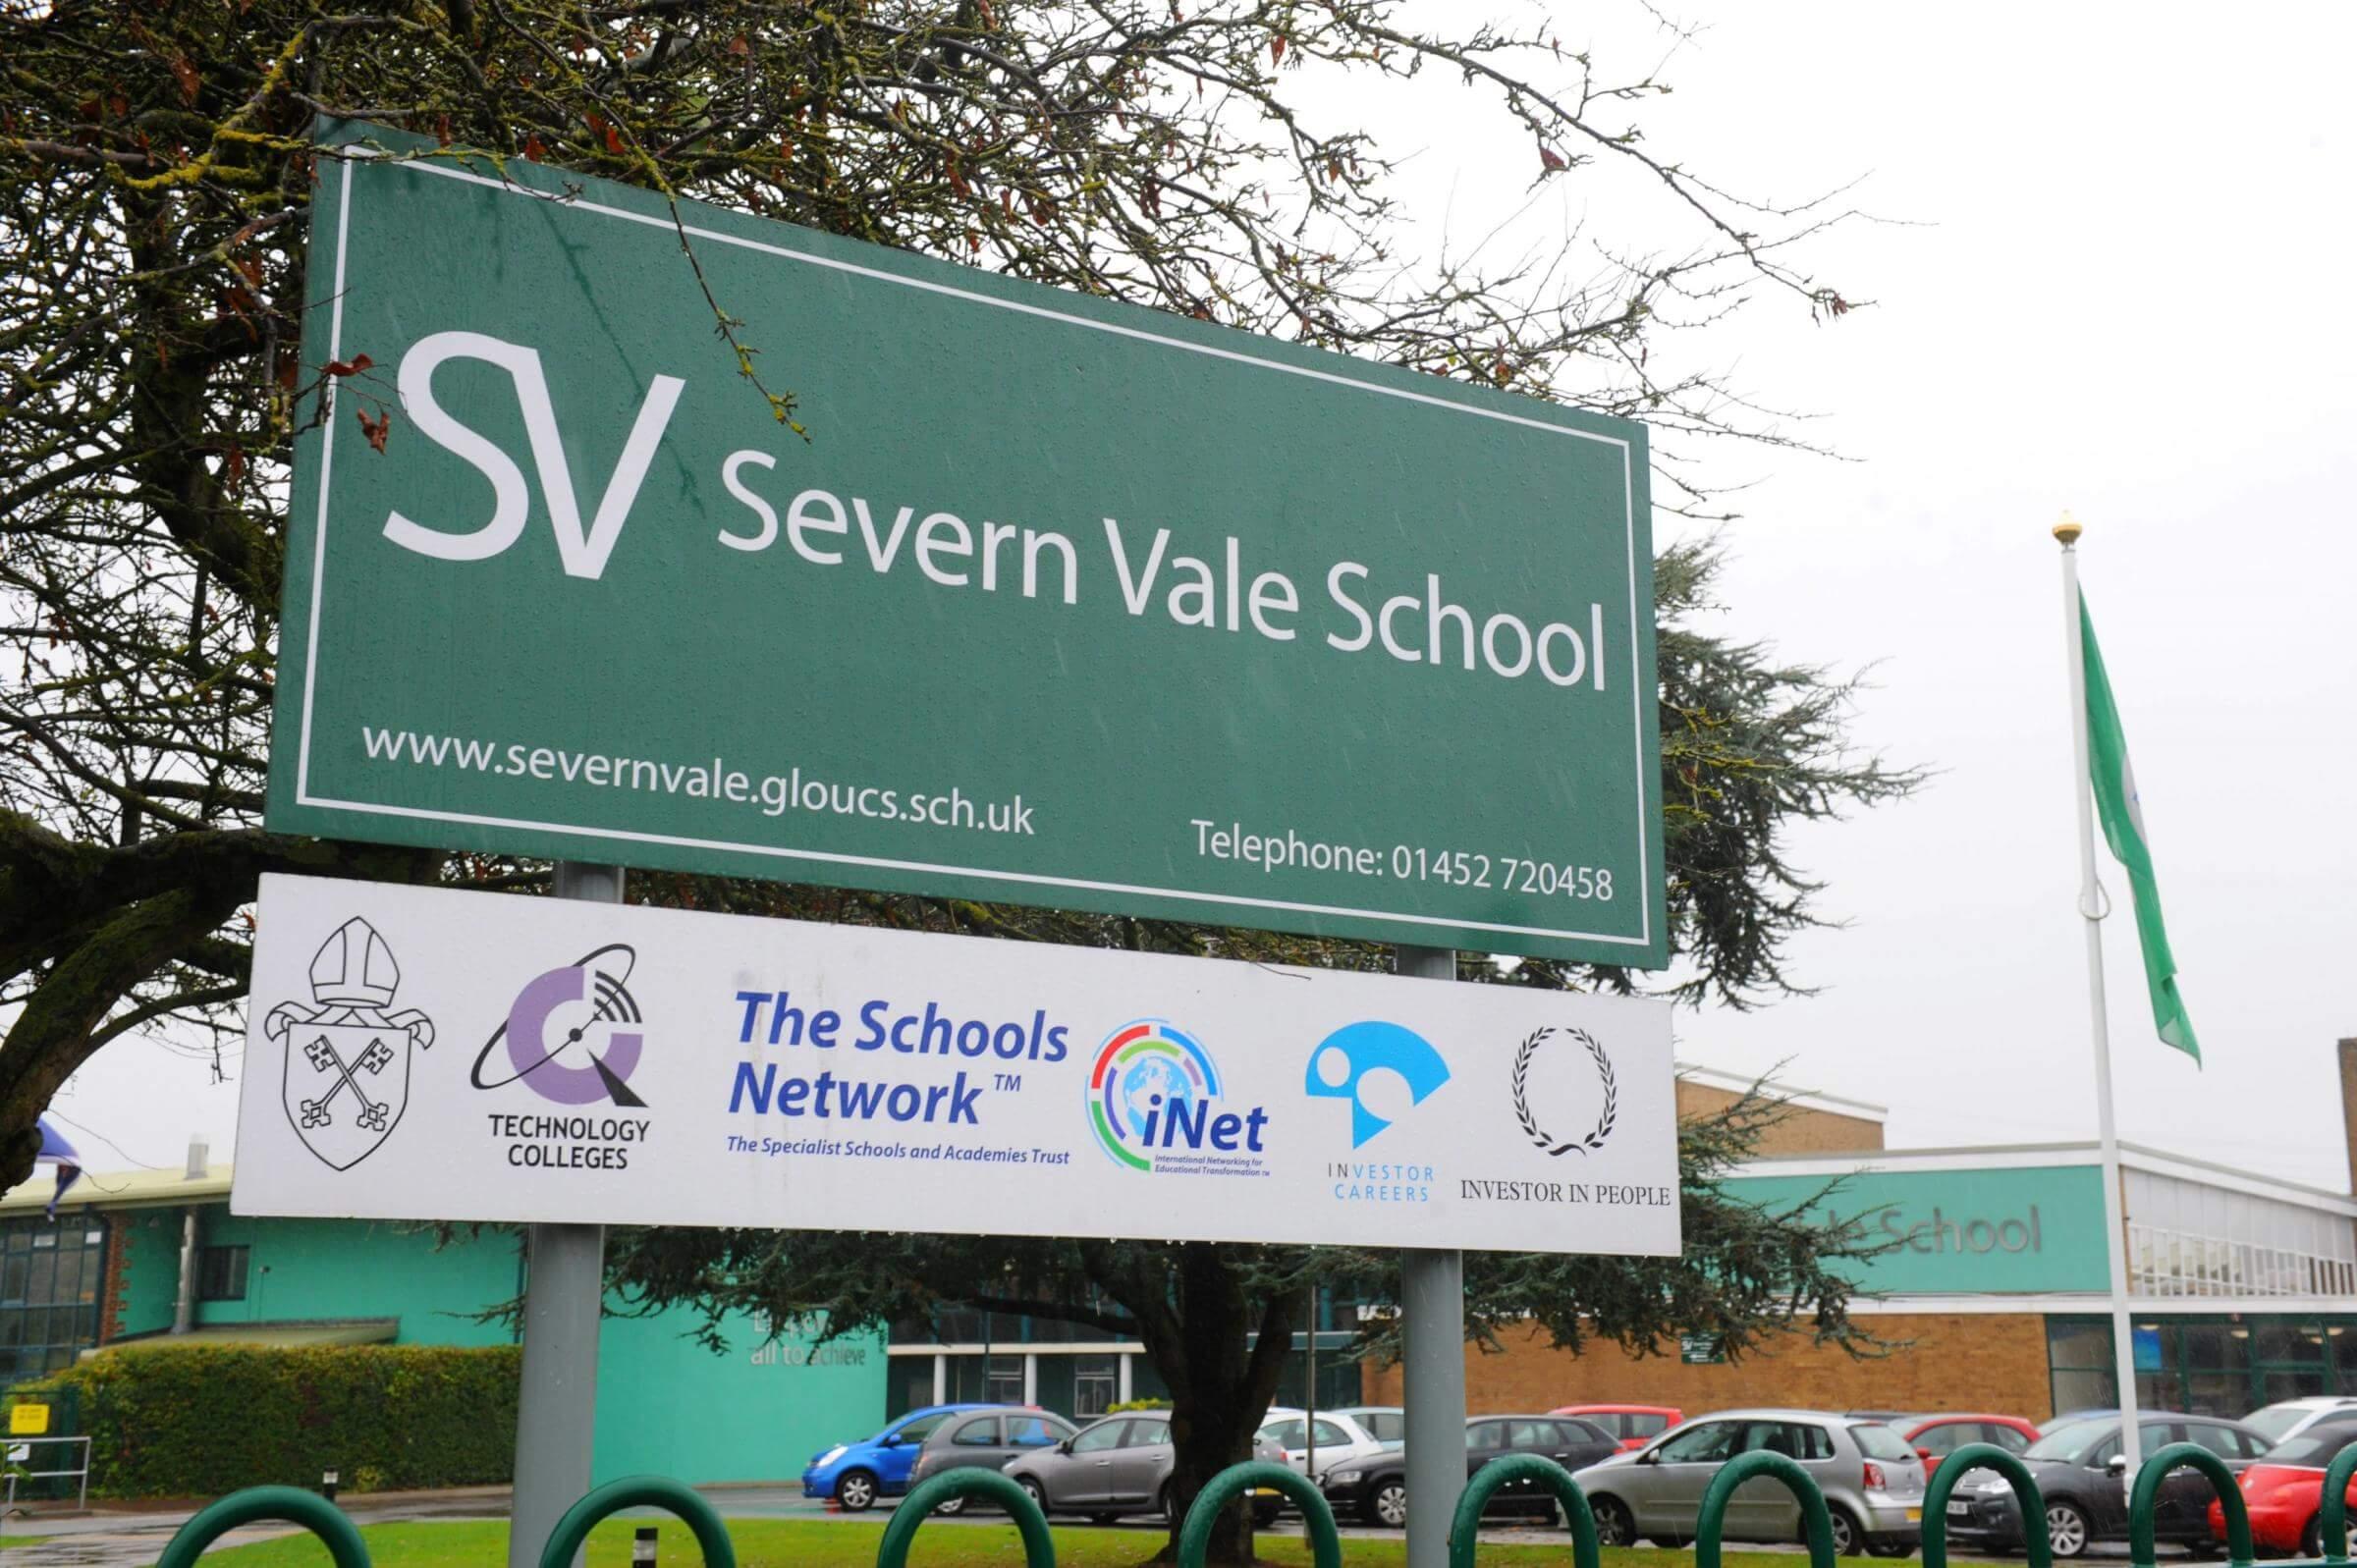 Severn Vale School building